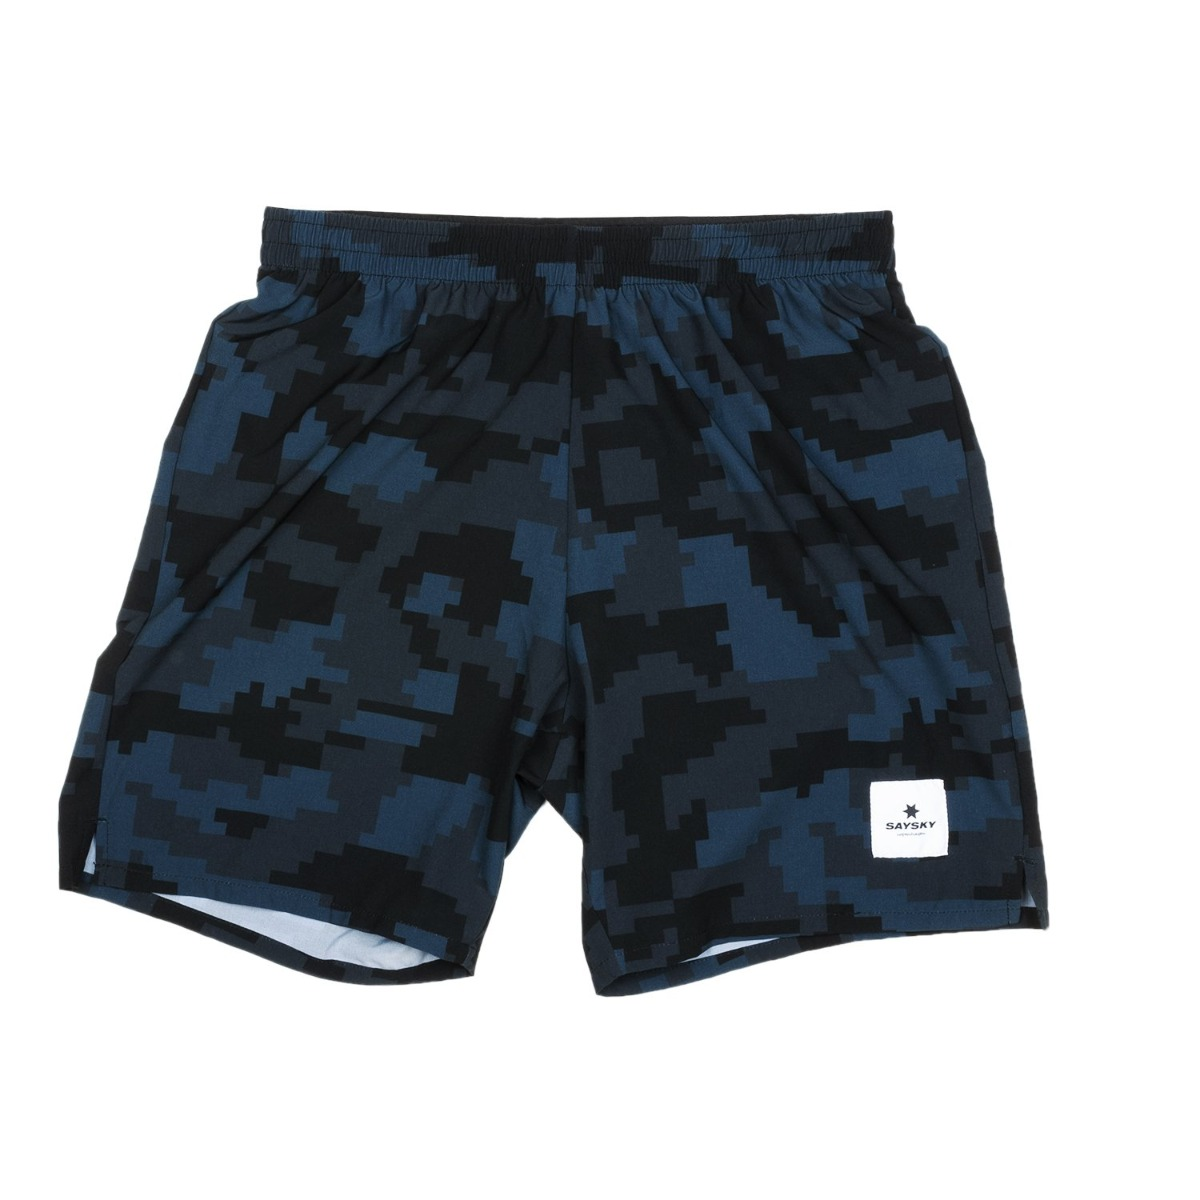 SaySky Camo Pace Long Shorts herre